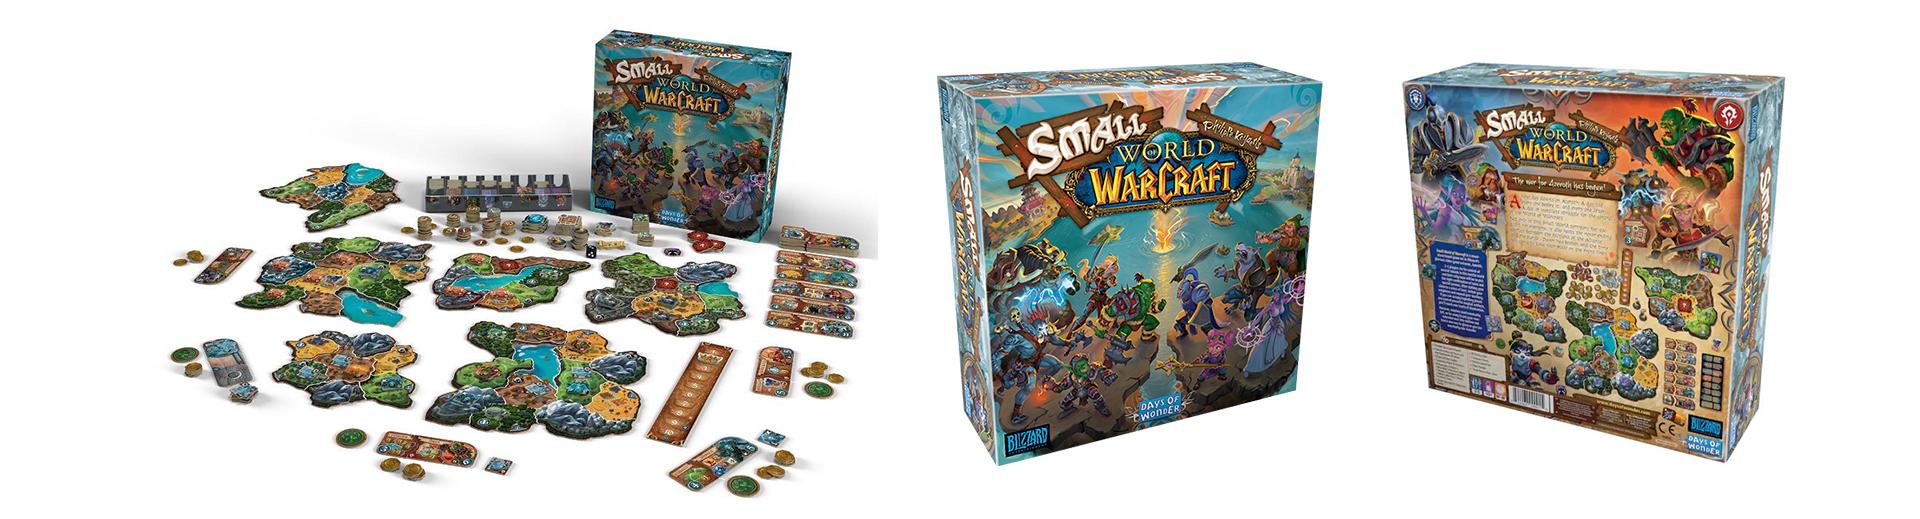 Small World of Warcraft - Days of Wonder